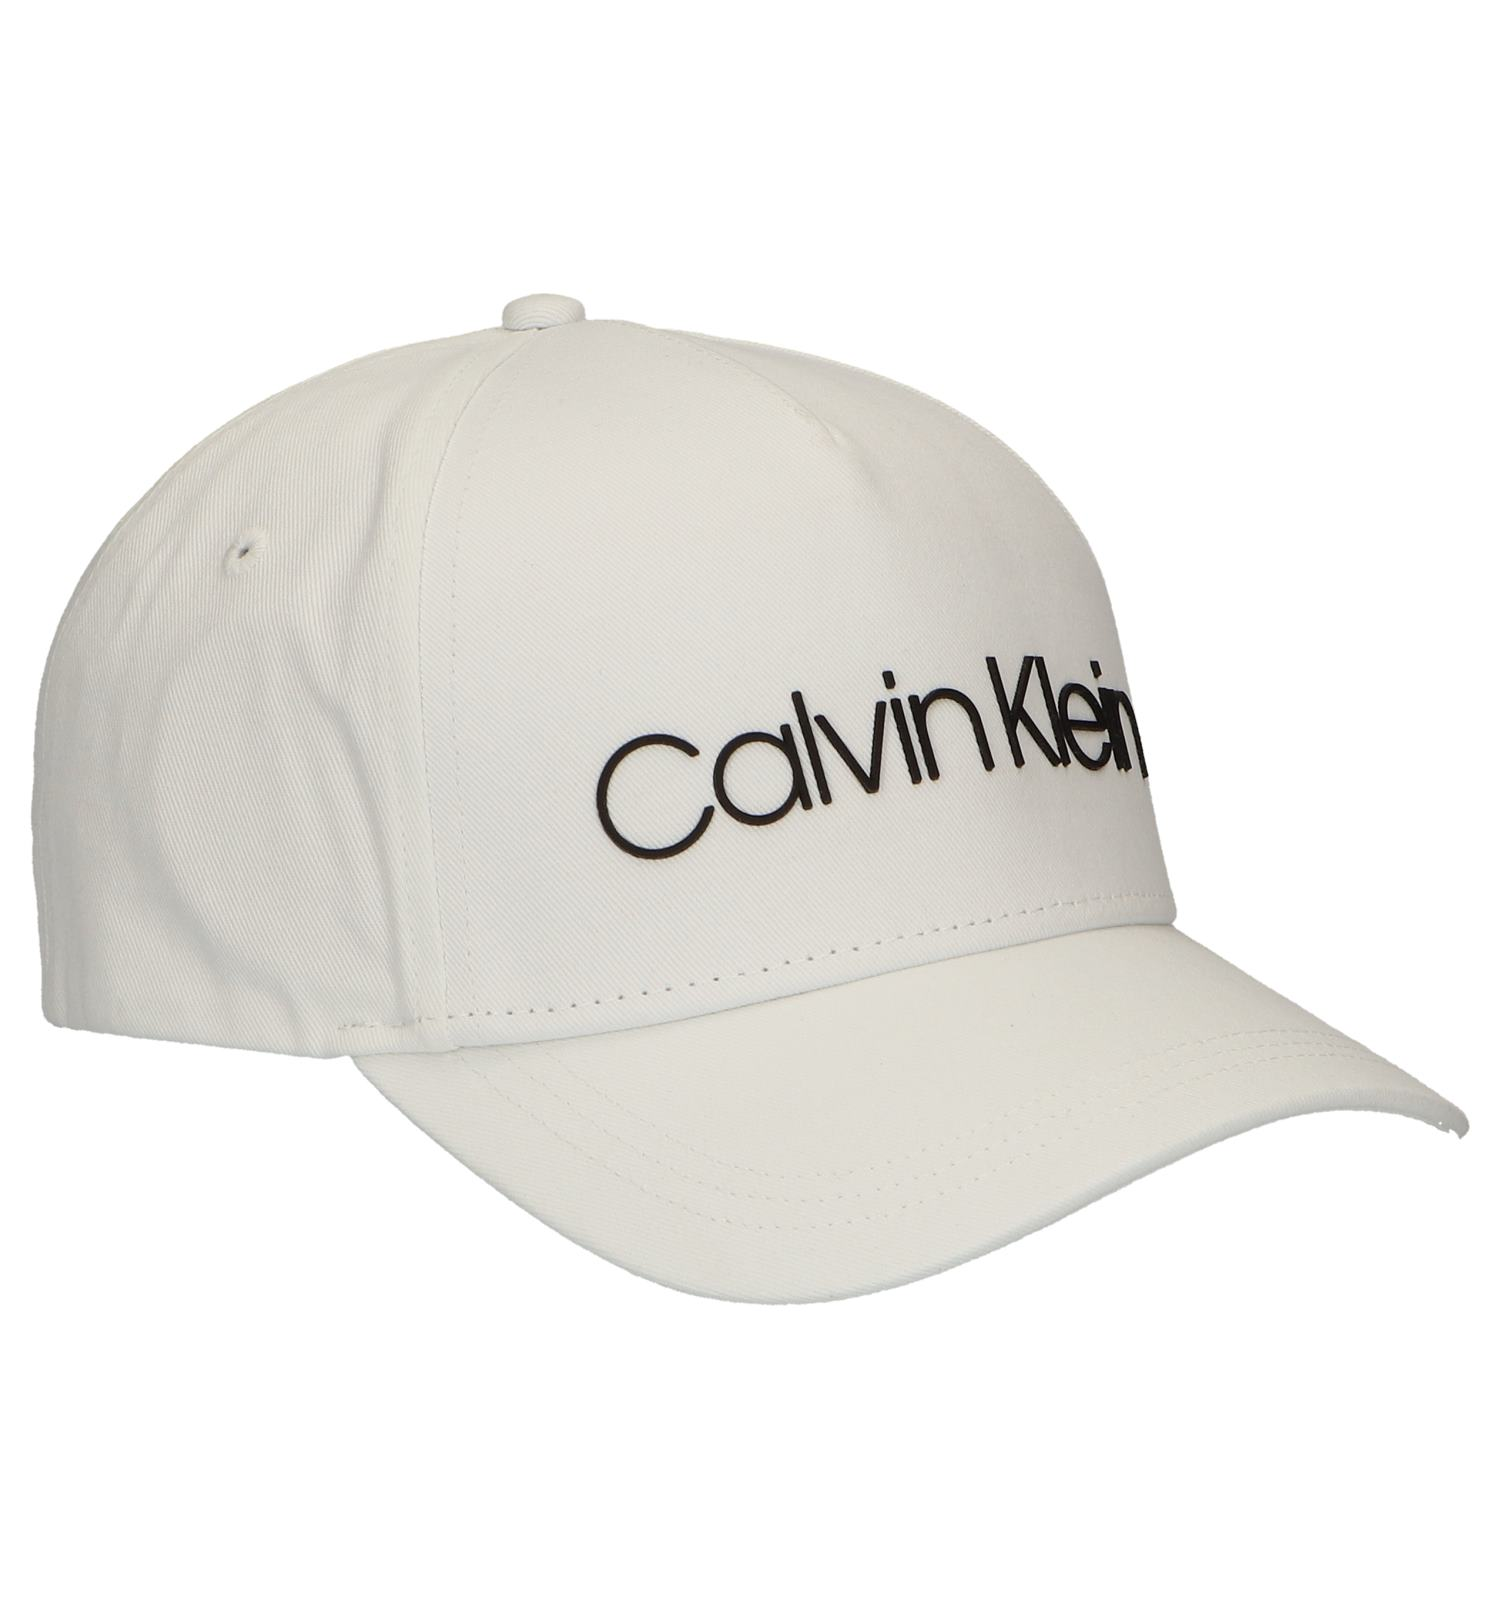 ab52d572 Witte Pet Calvin Klein Sliver Contrast Trucker Cap   TORFS.BE   Gratis  verzend en retour